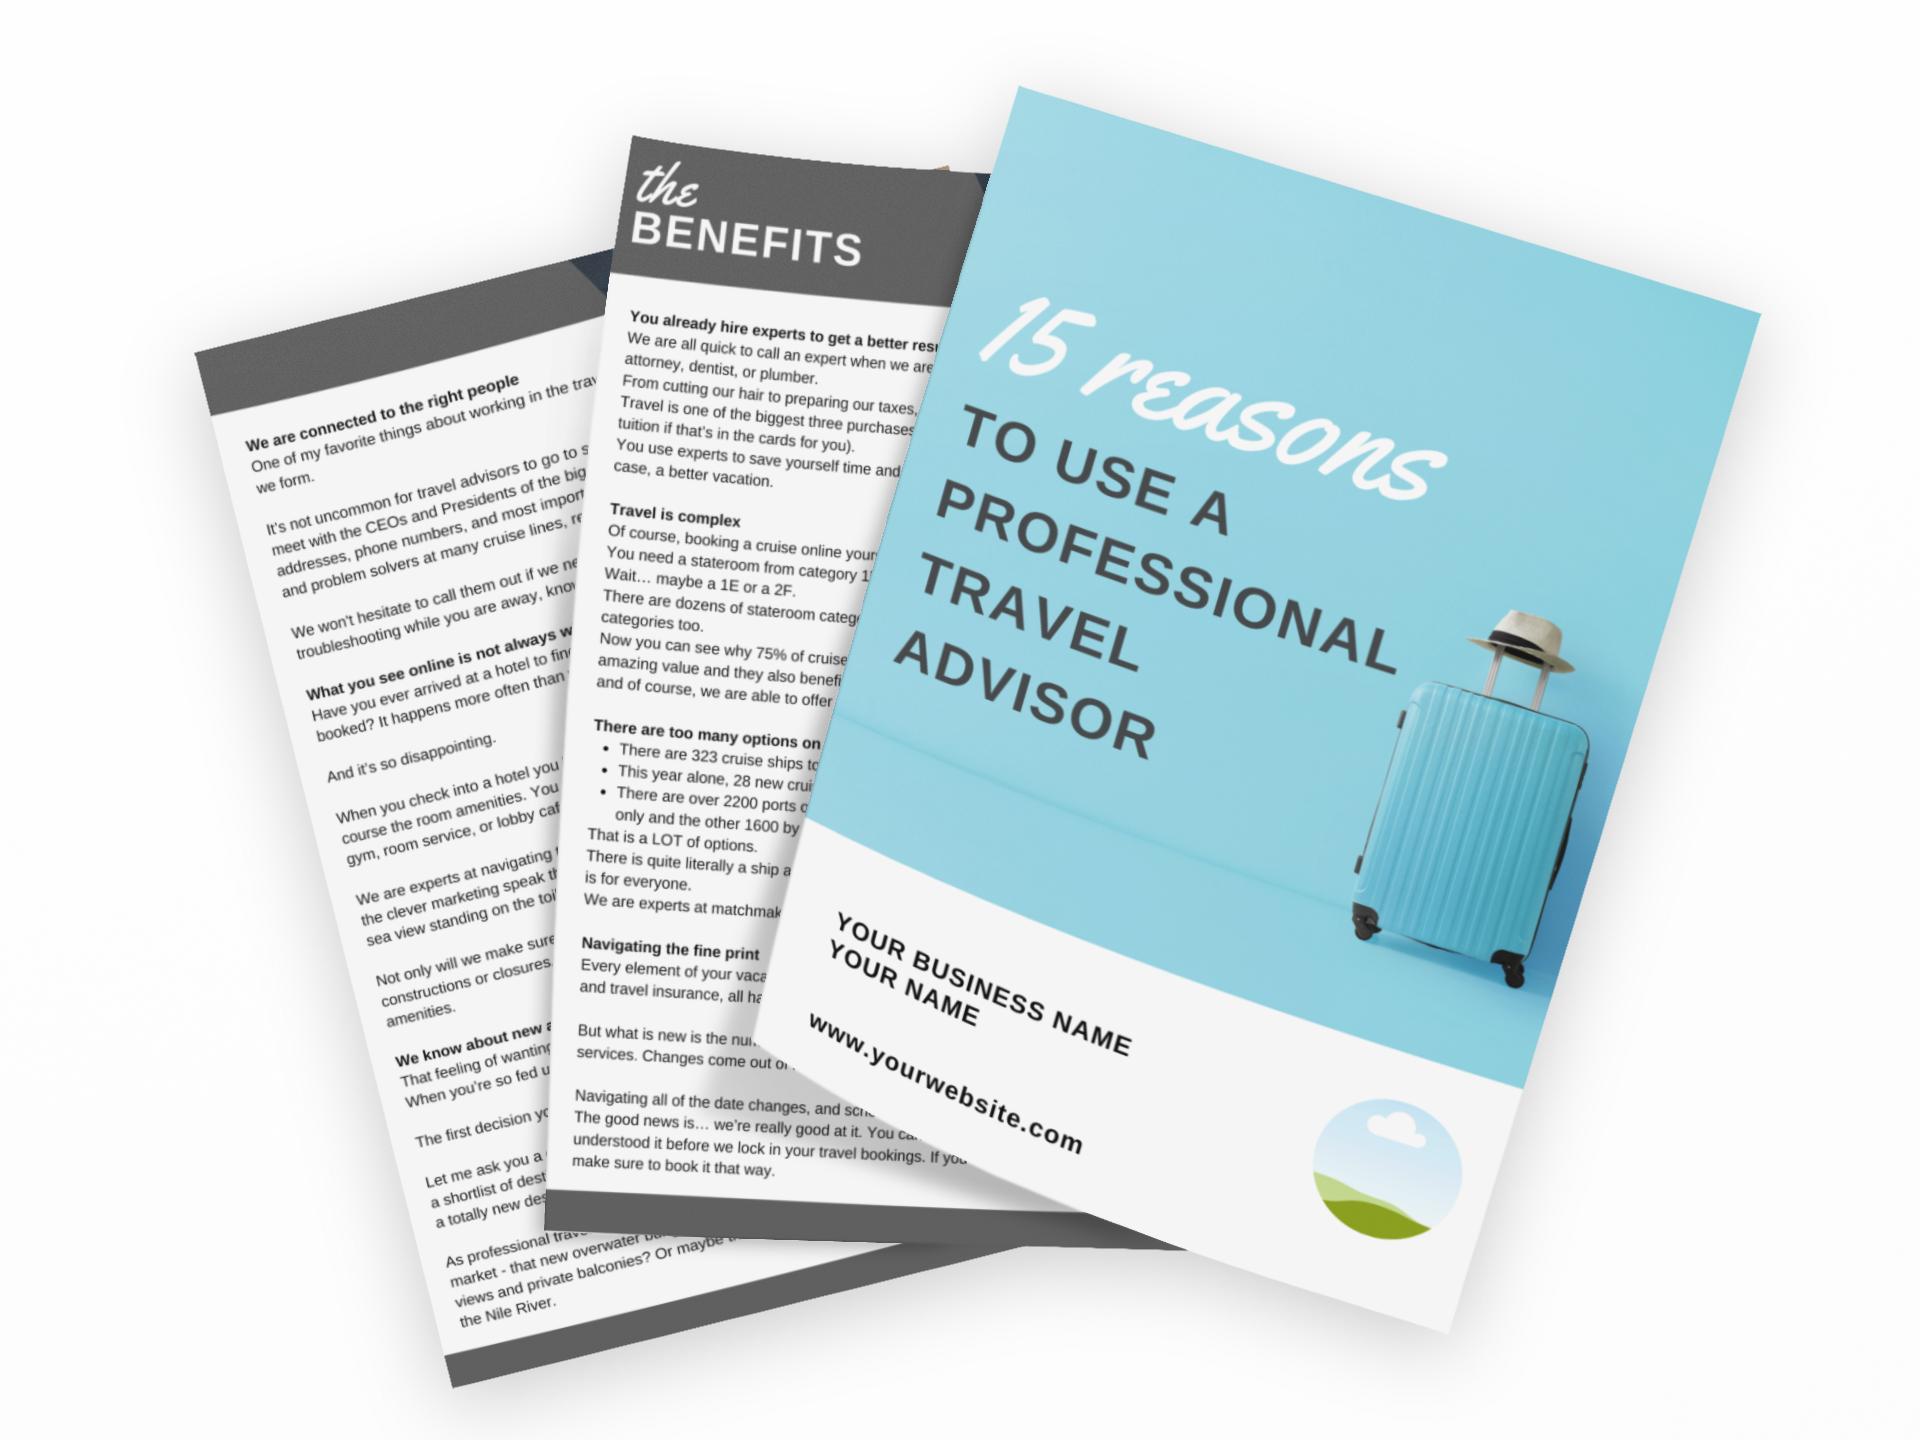 REASONS TO USE A PROFESSIONAL TRAVEL ADVISOR